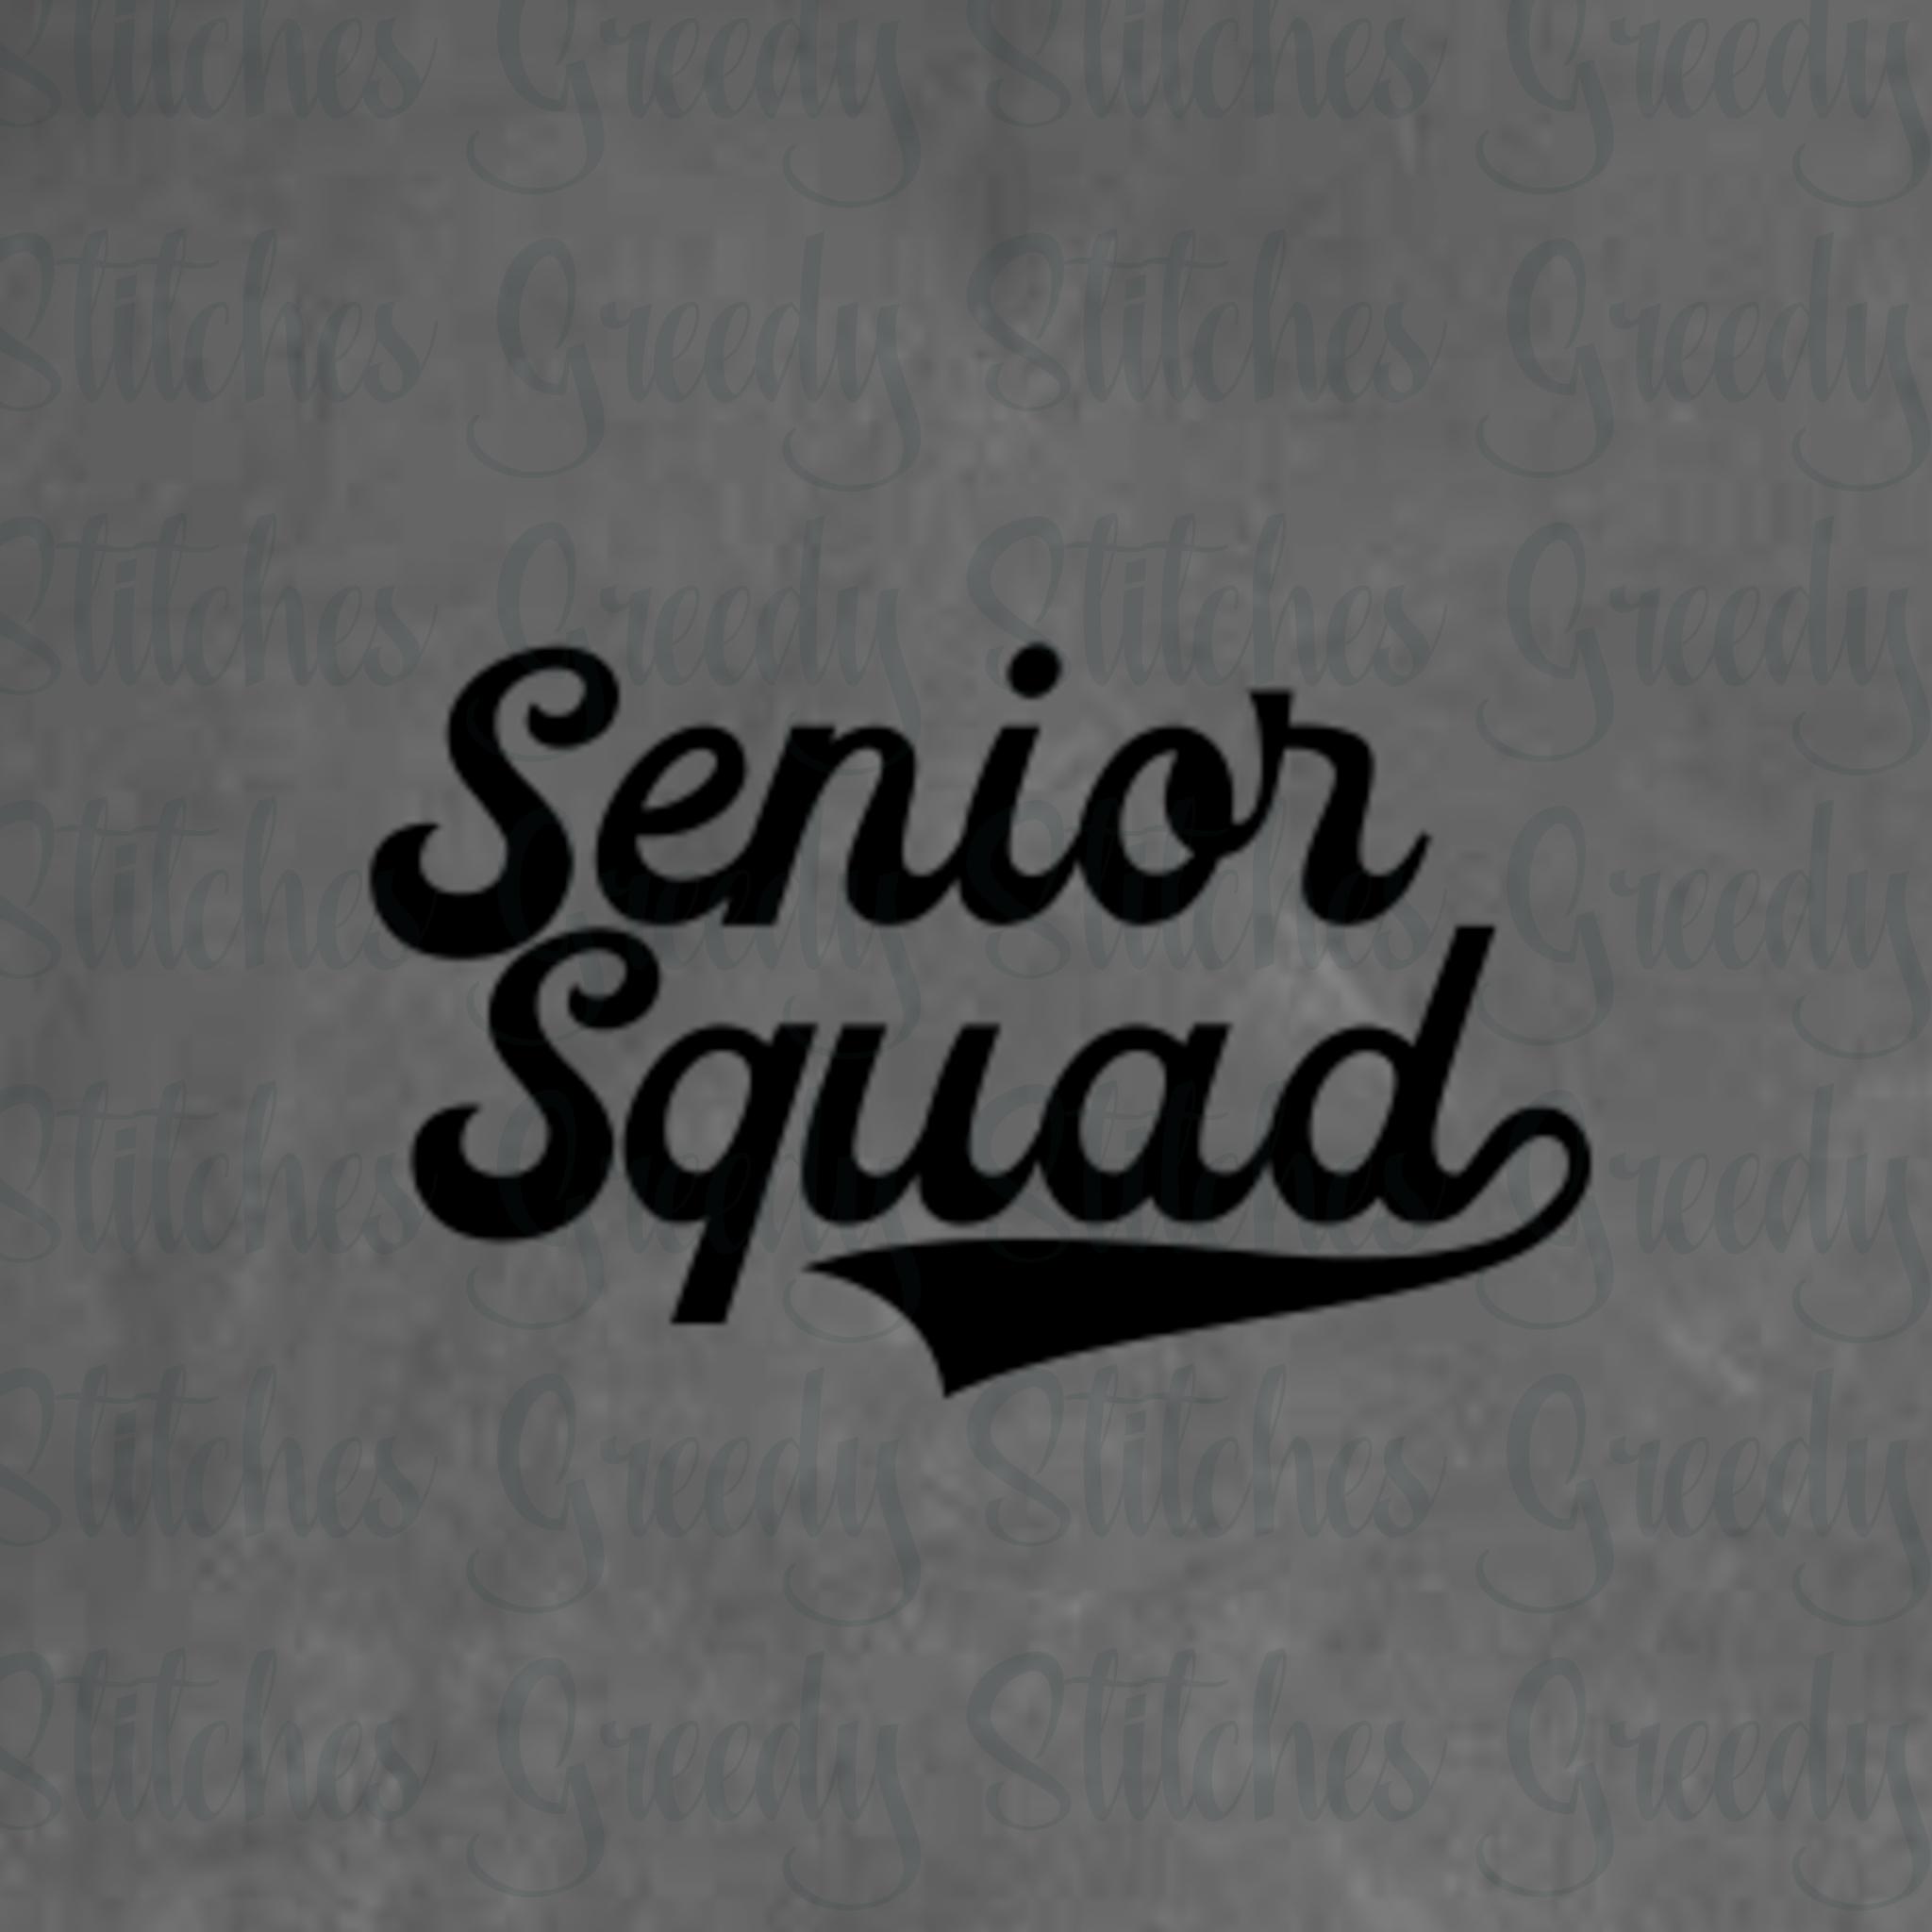 c6fd2e8fc Class of 2019 Senior Bundle svg, dxf, eps, png. Senior 2019 example